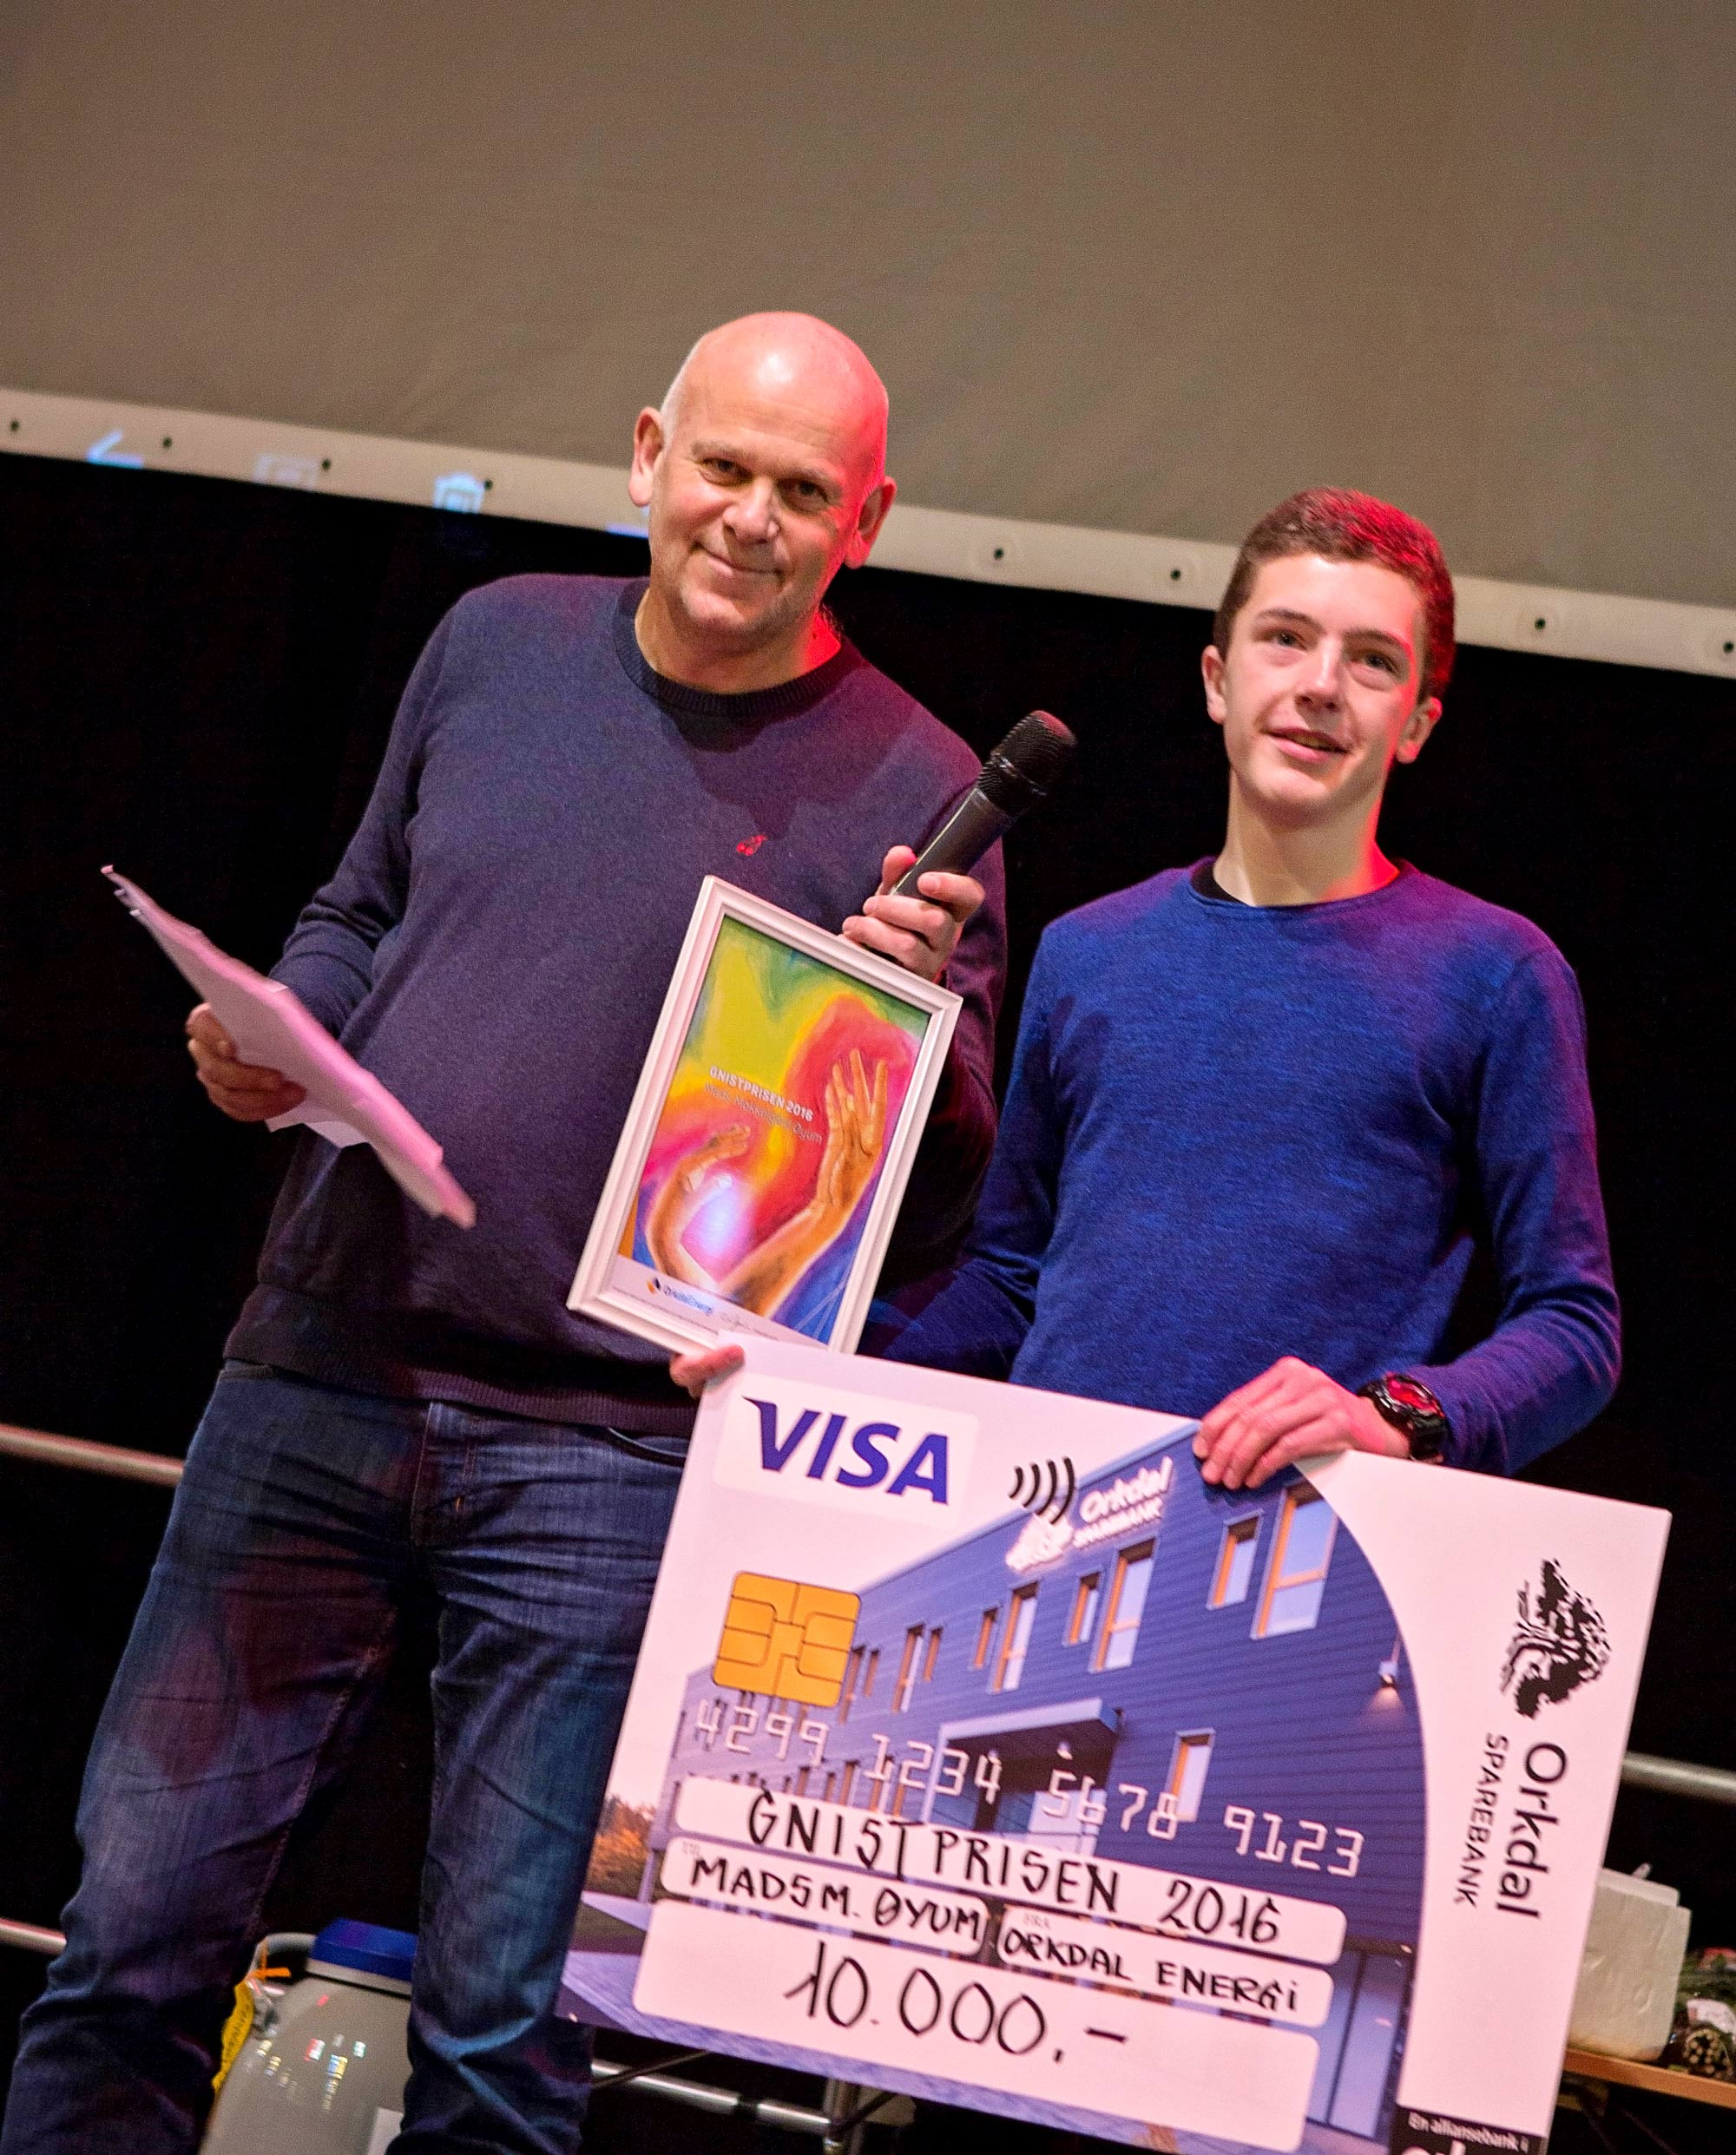 Daglig leder på Orkdal Energi, Eirik deler ut diplom og vinnerpremien til Mads